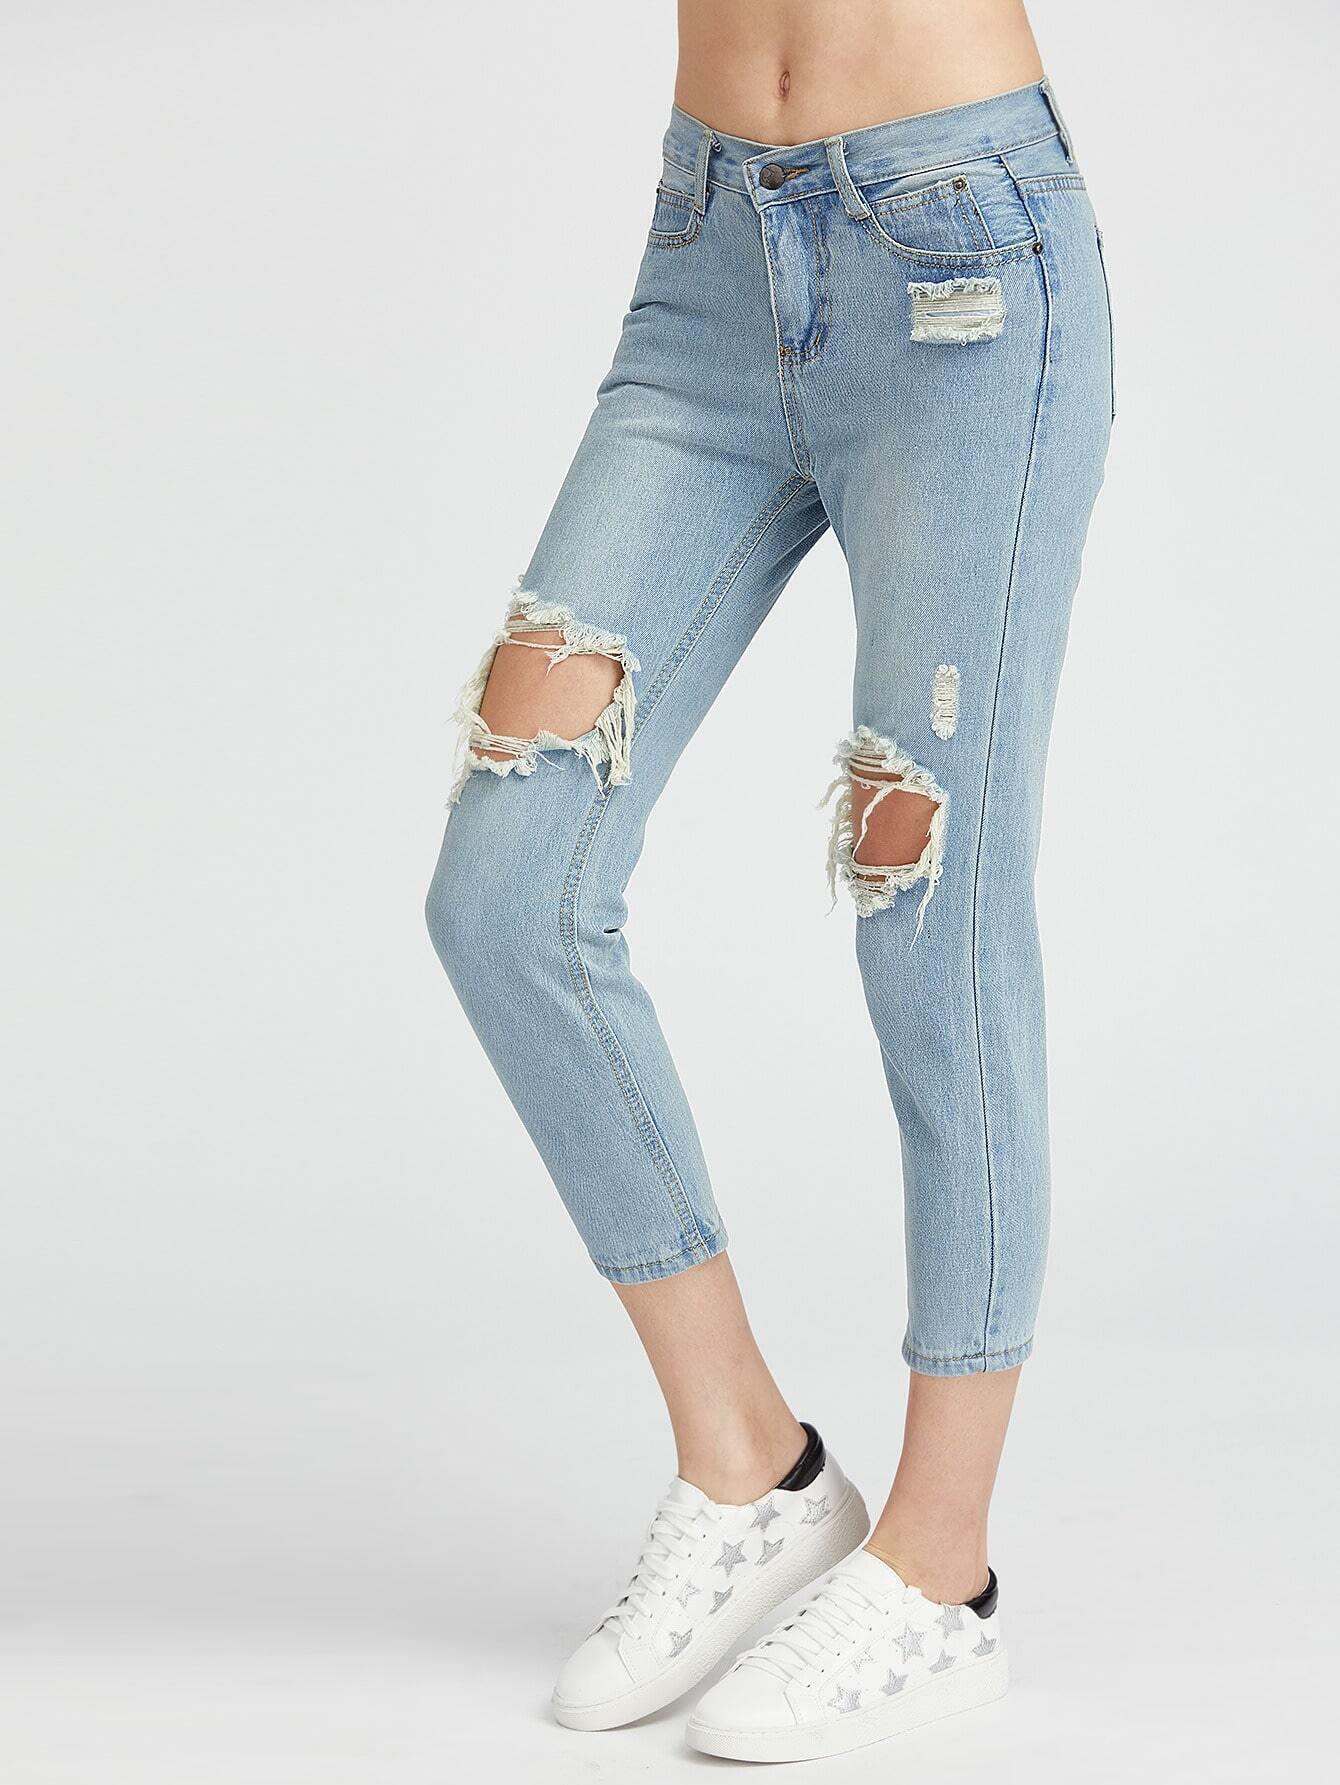 Destroy Washed Sheath Jeans